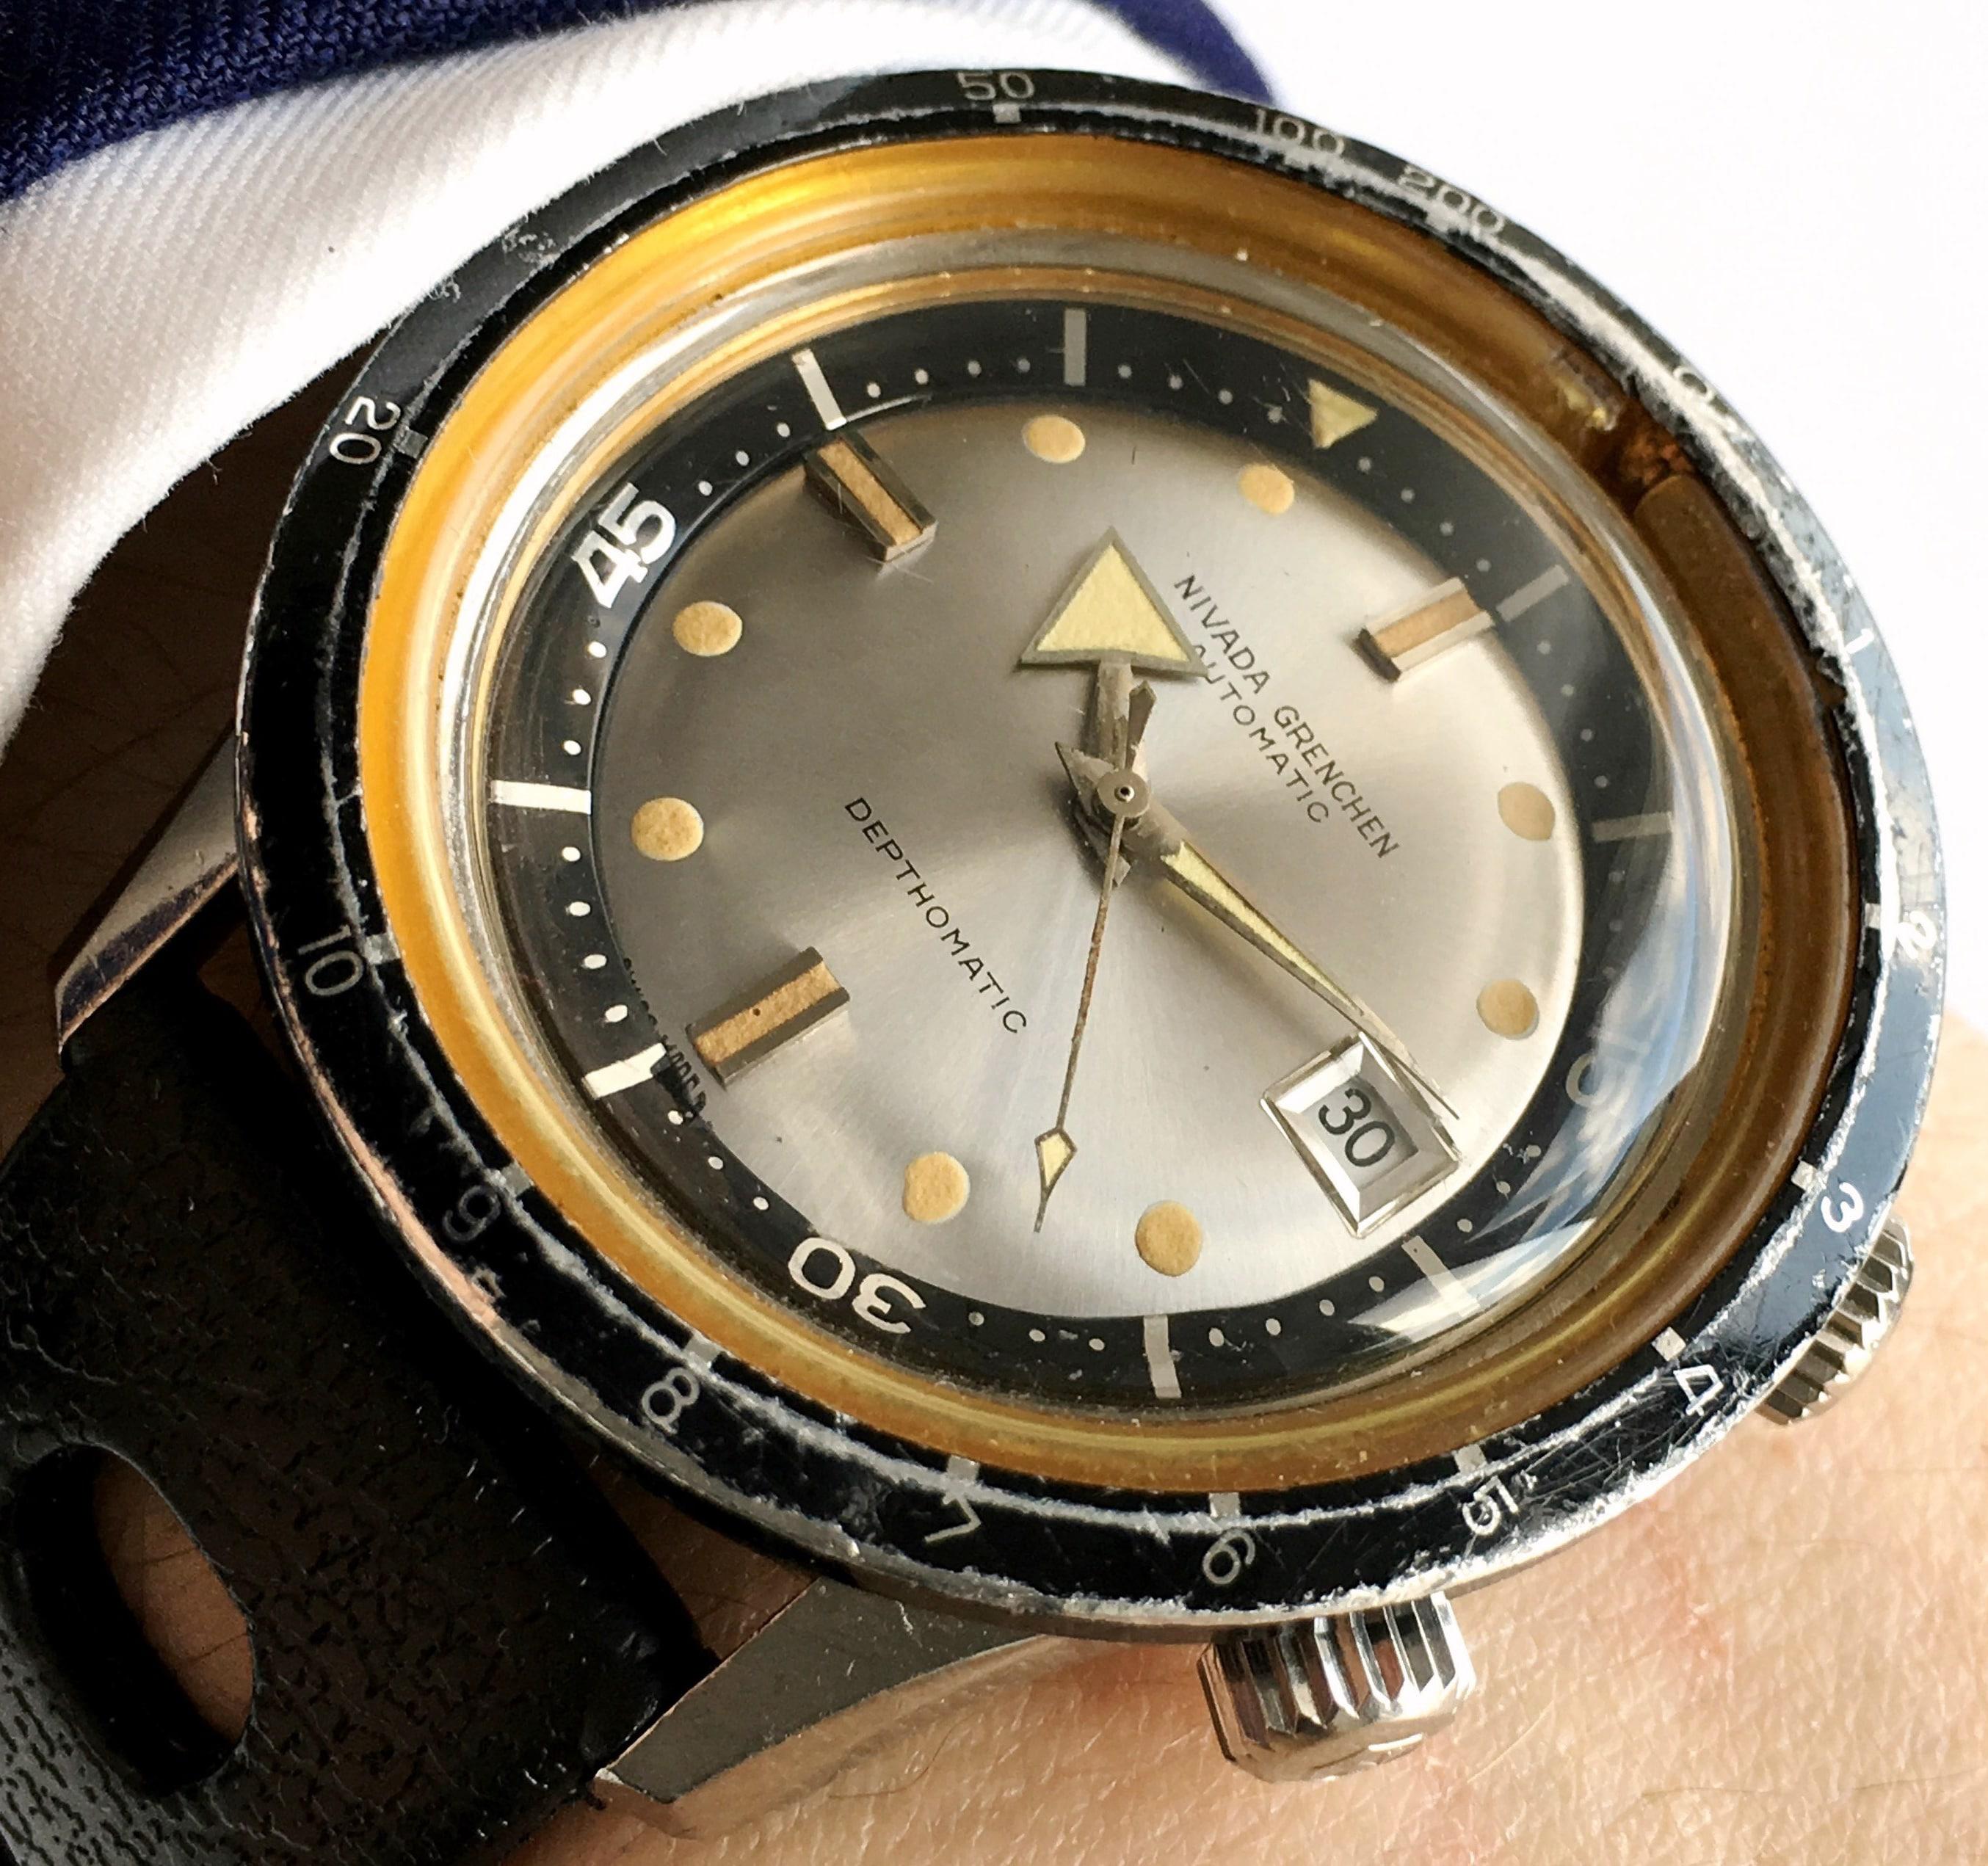 Broad Arrow Nivada Grenchen Depthomatic Diver Watch Vintage